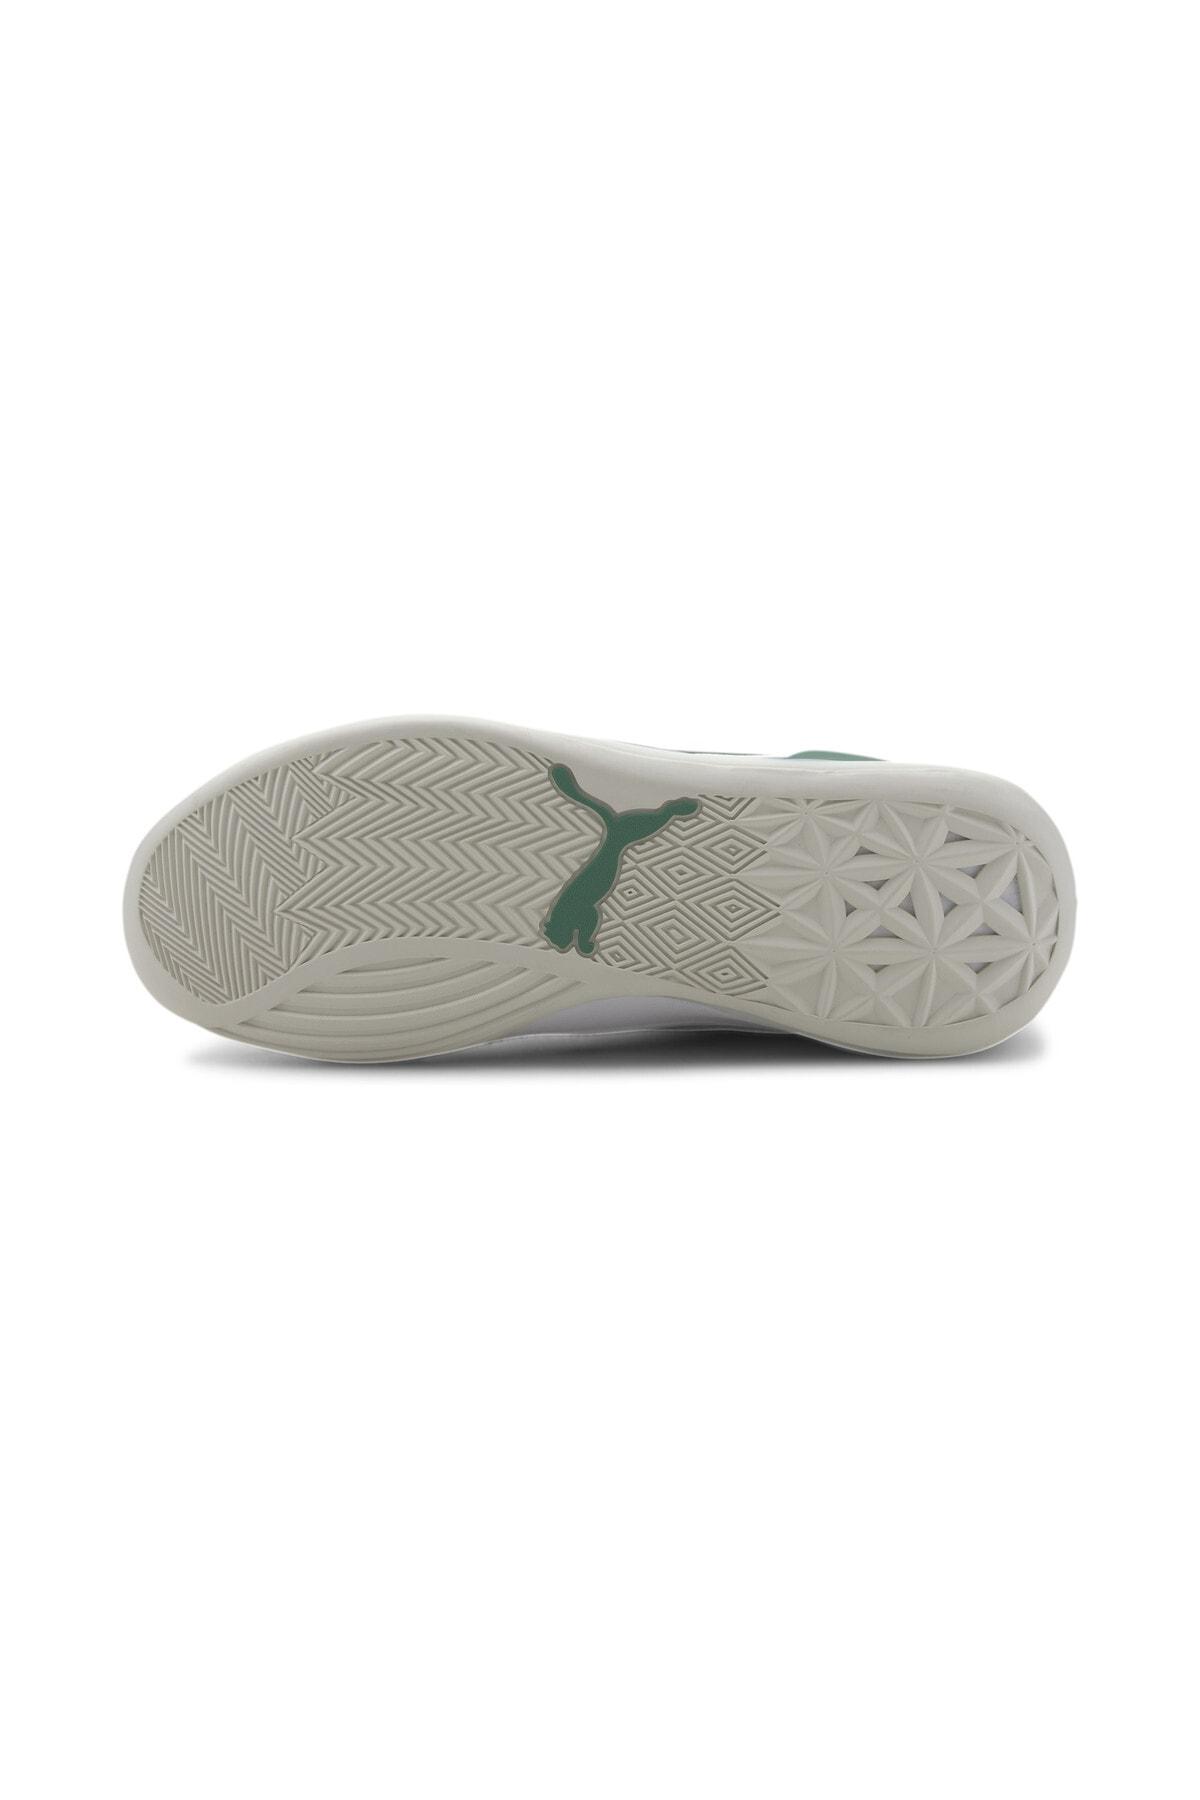 Puma Clyde Hardwood Basketbol Ayakkabısı 3